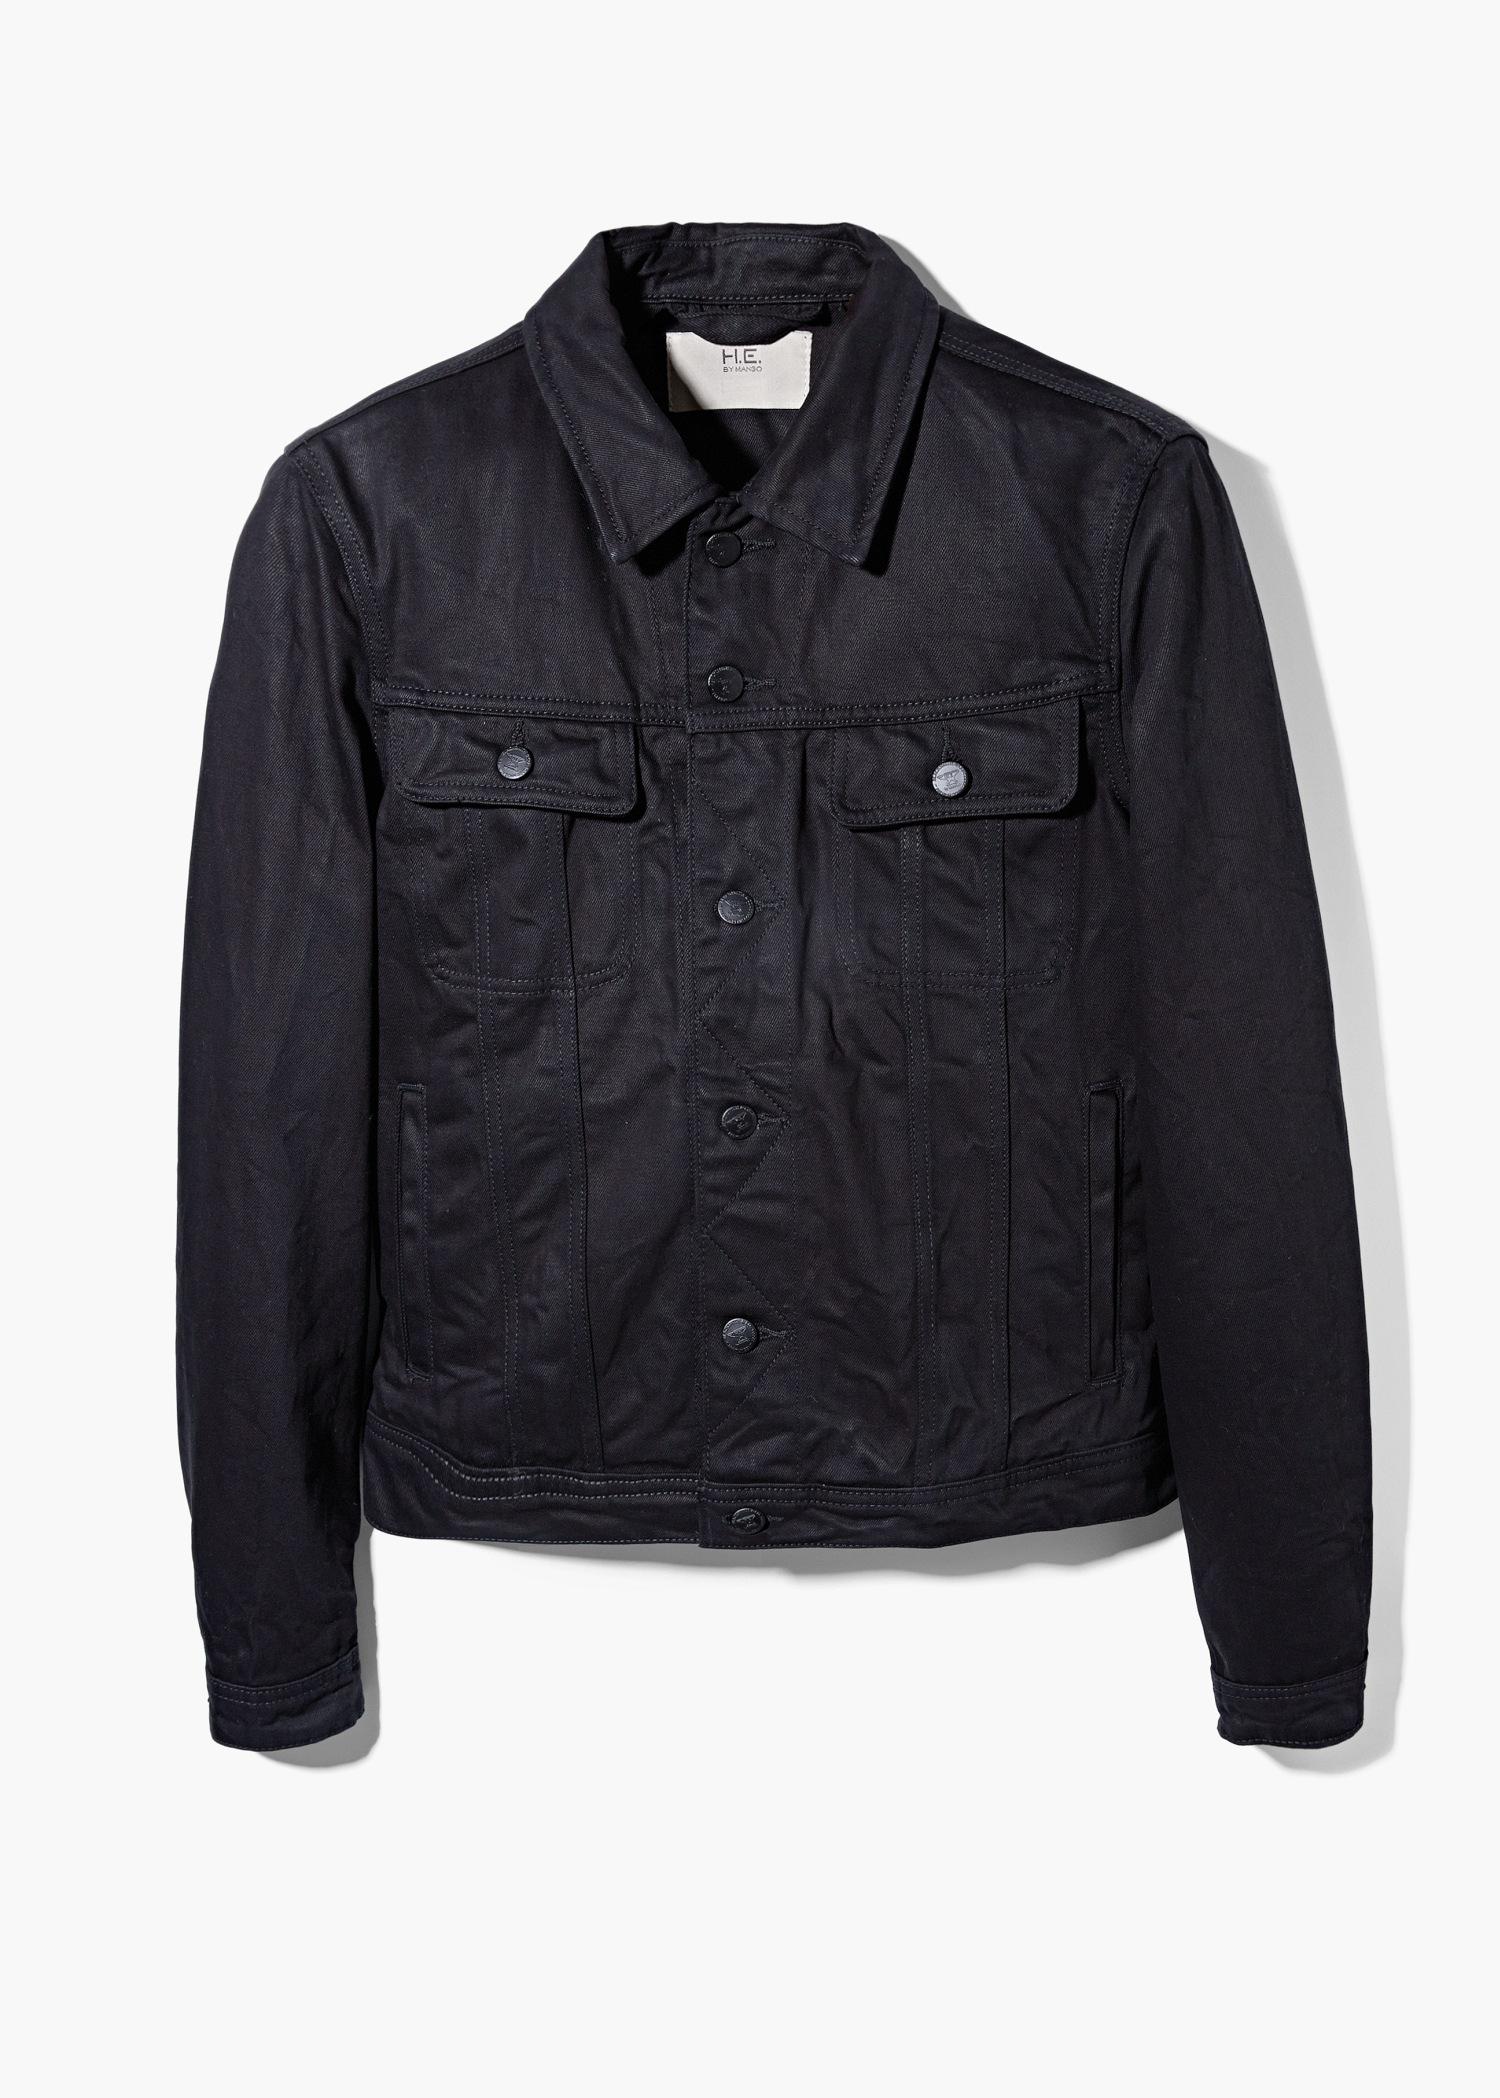 Mango Black Denim Jacket In Gray For Men - Lyst-1792